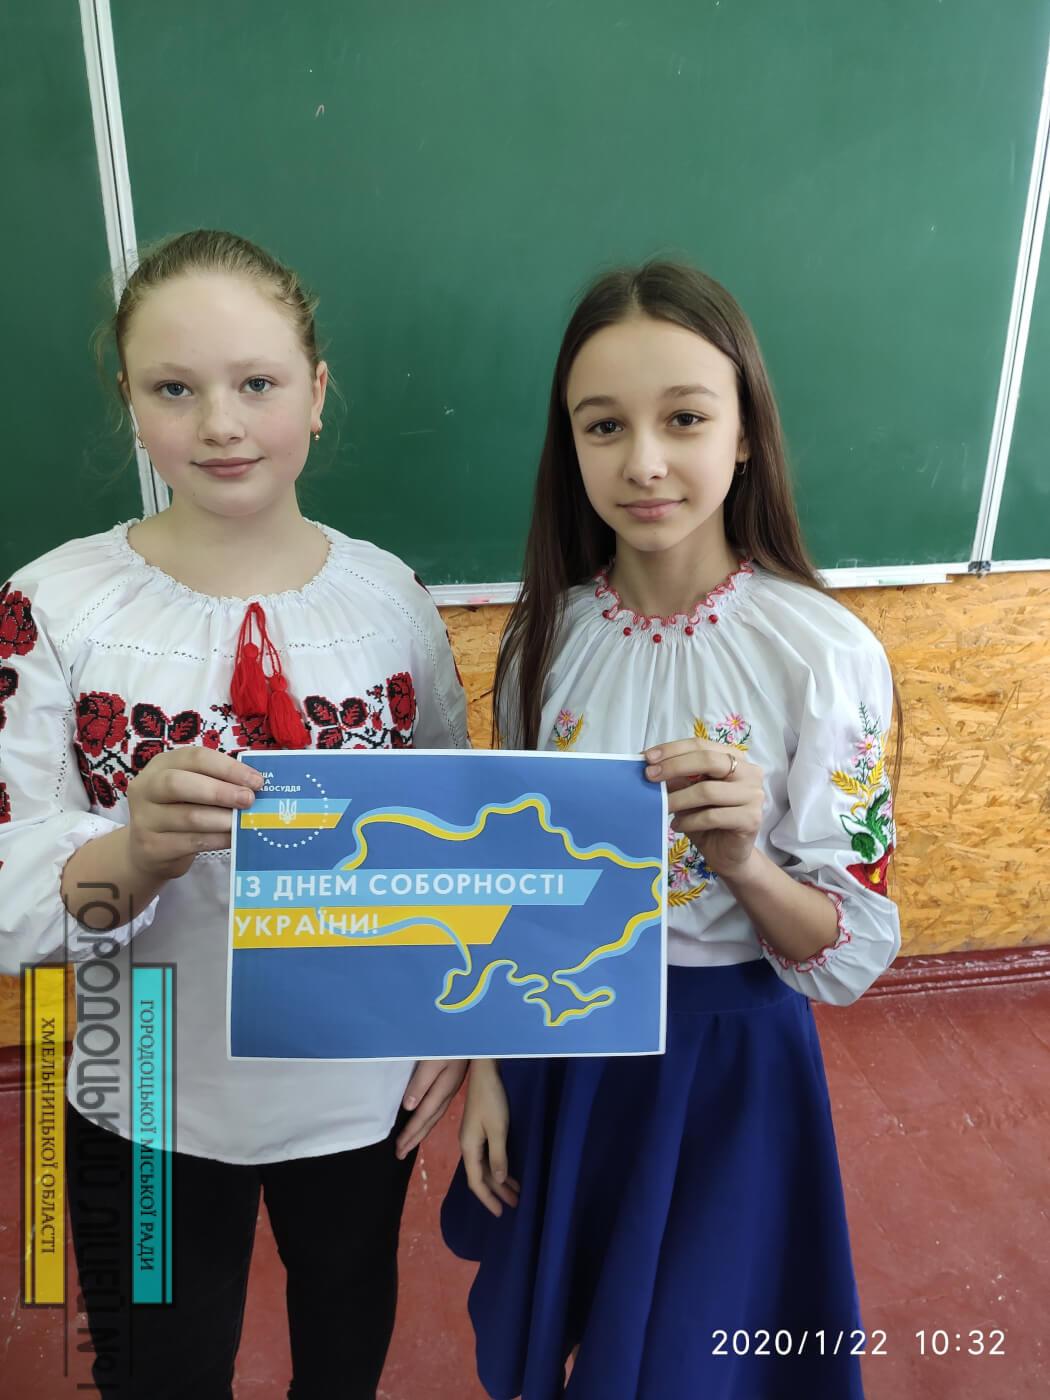 IMG 20200122 103226 e1579705219258 - День Соборності України